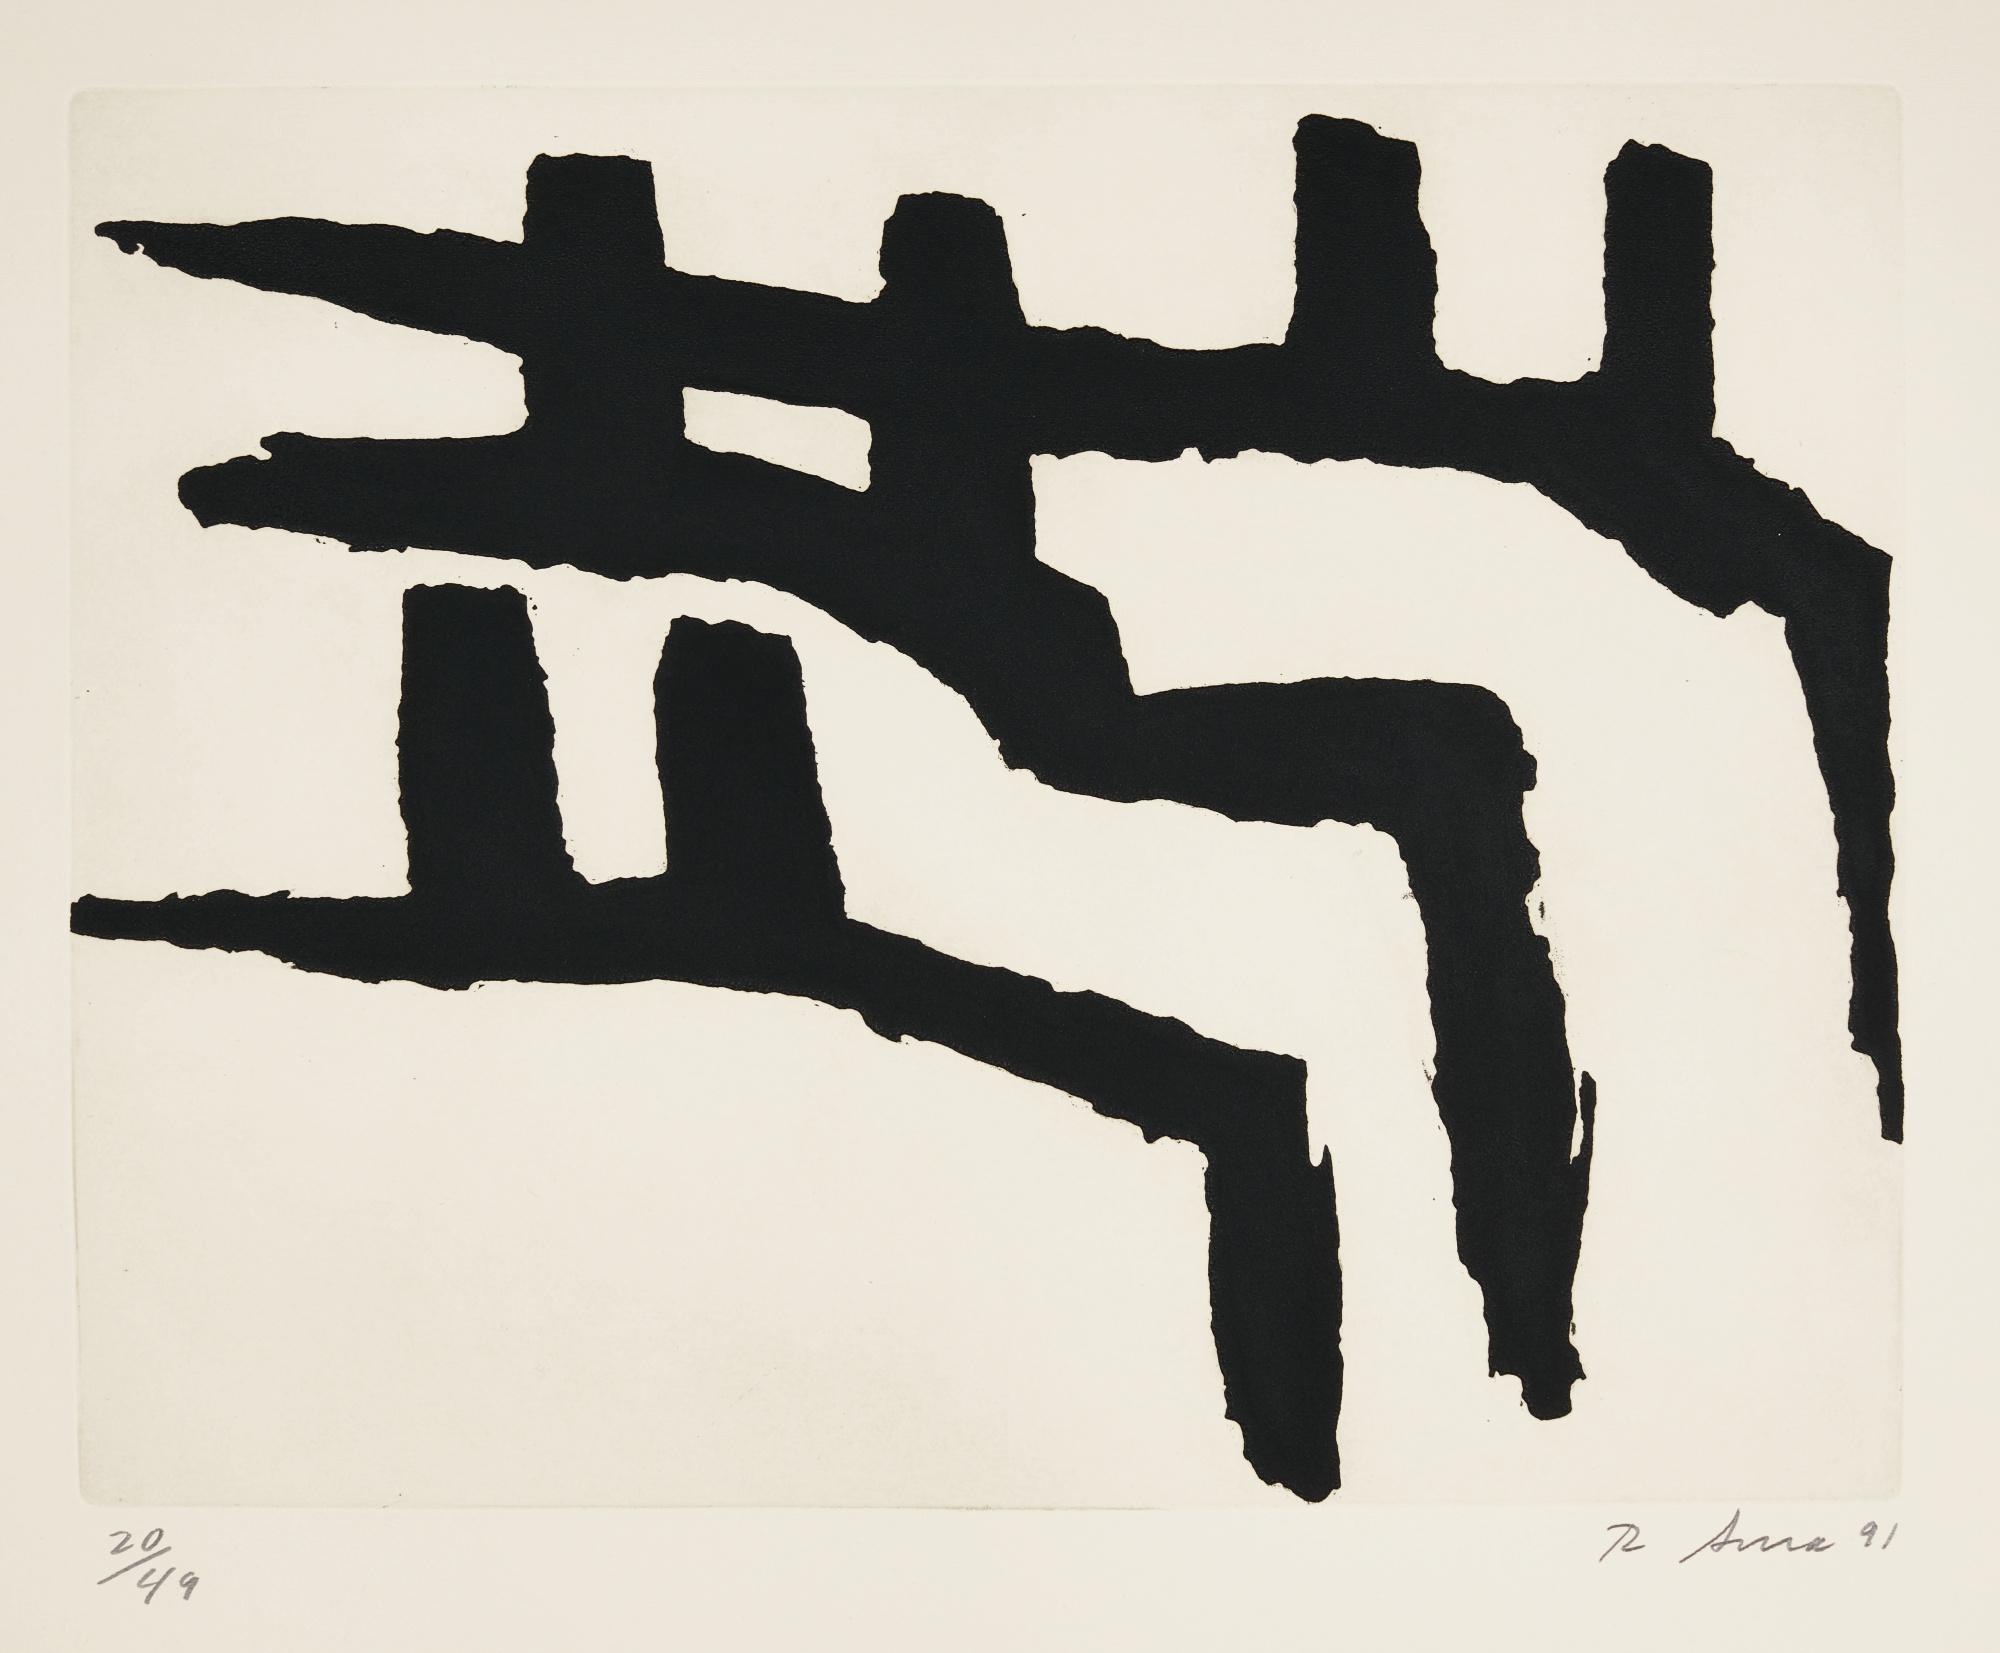 Richard Serra-Eidid II (Berswordt-Wallrabe 89; Gemini 1555)-1991